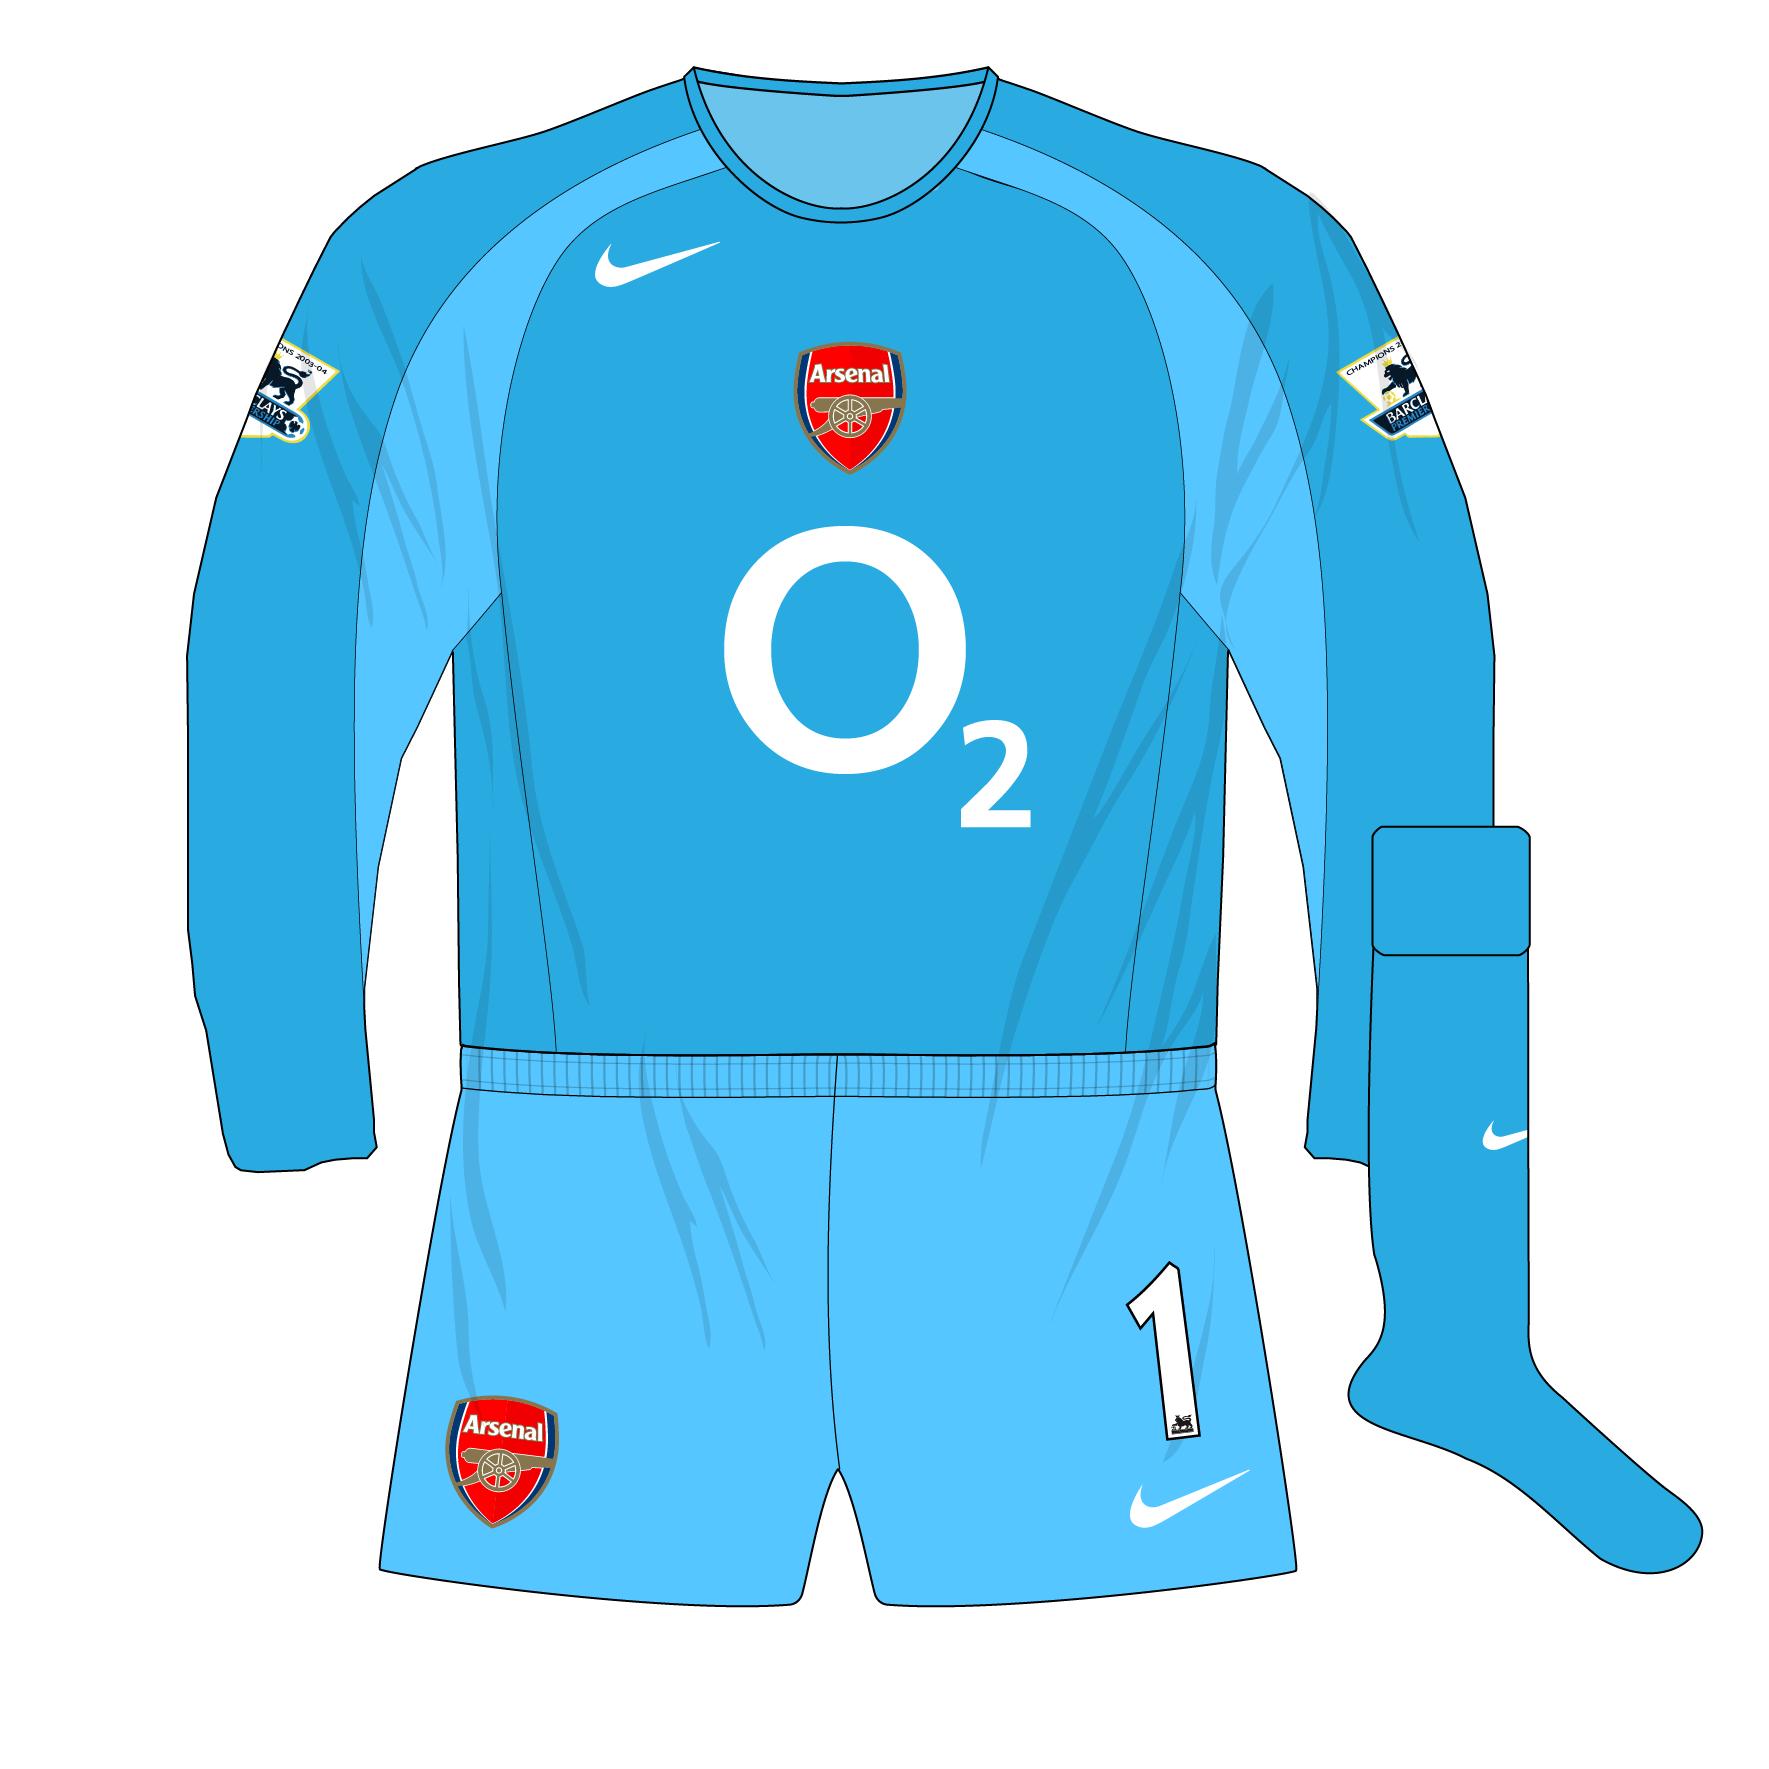 Arsenal Nike 2004 2005 Blue Goalkeeper Shirt Kit Lehmann 01 Museum